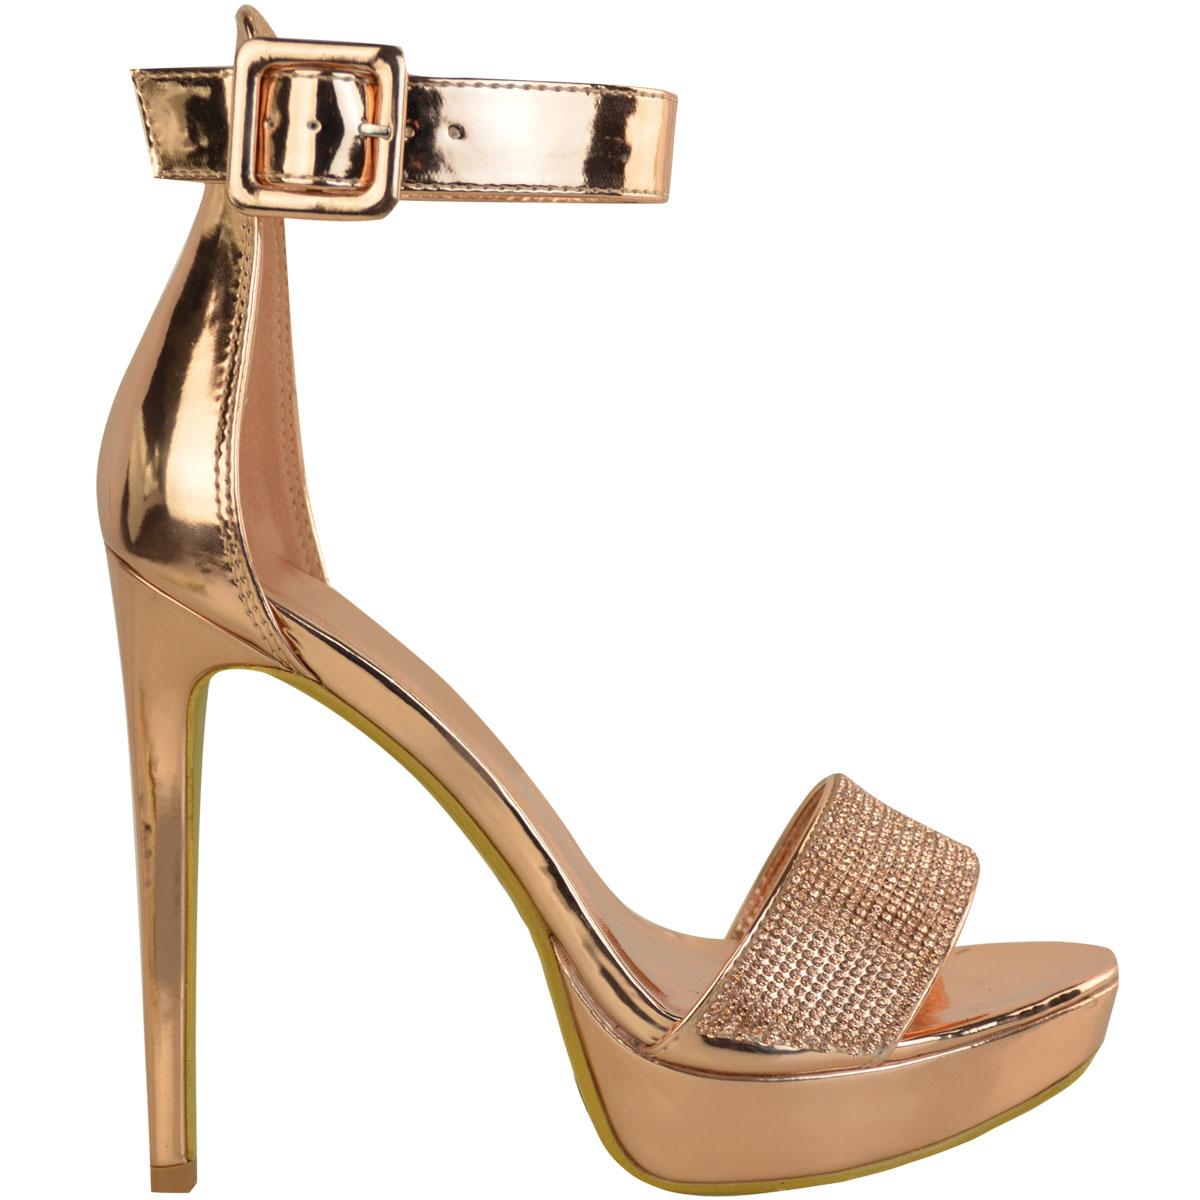 Womens-Ladies-Stilettos-High-Heels-Strappy-Platforms-Sandals-Diamante-Shoes-Size thumbnail 23